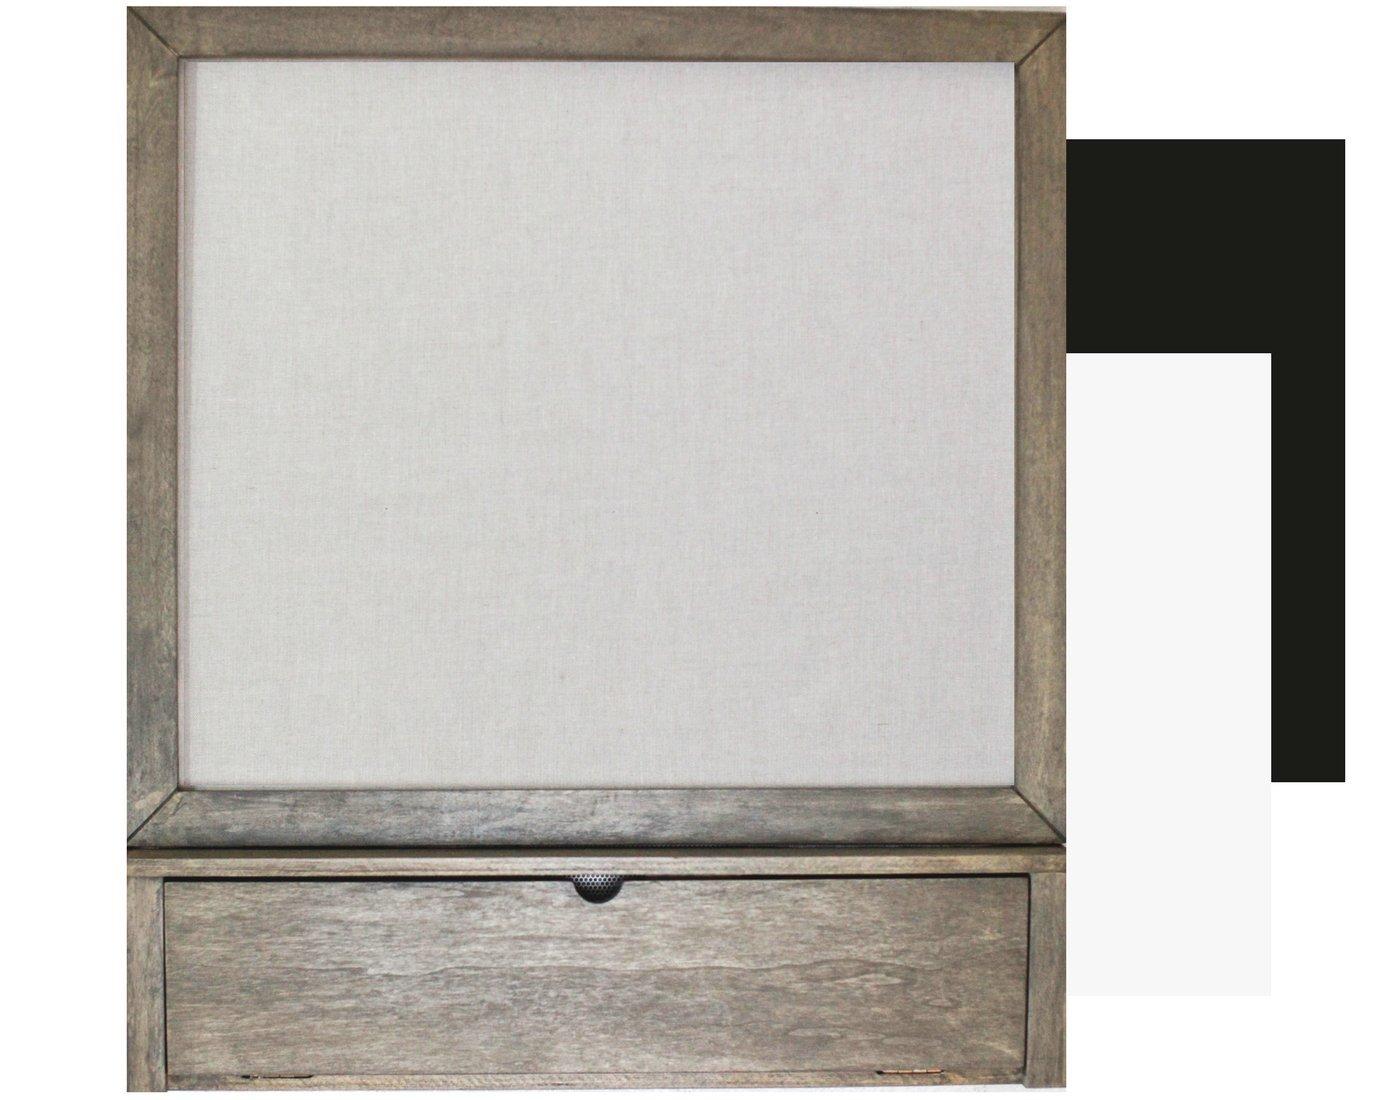 Signature Chart à la Carte Magnetic Pin Board (Driftwood)